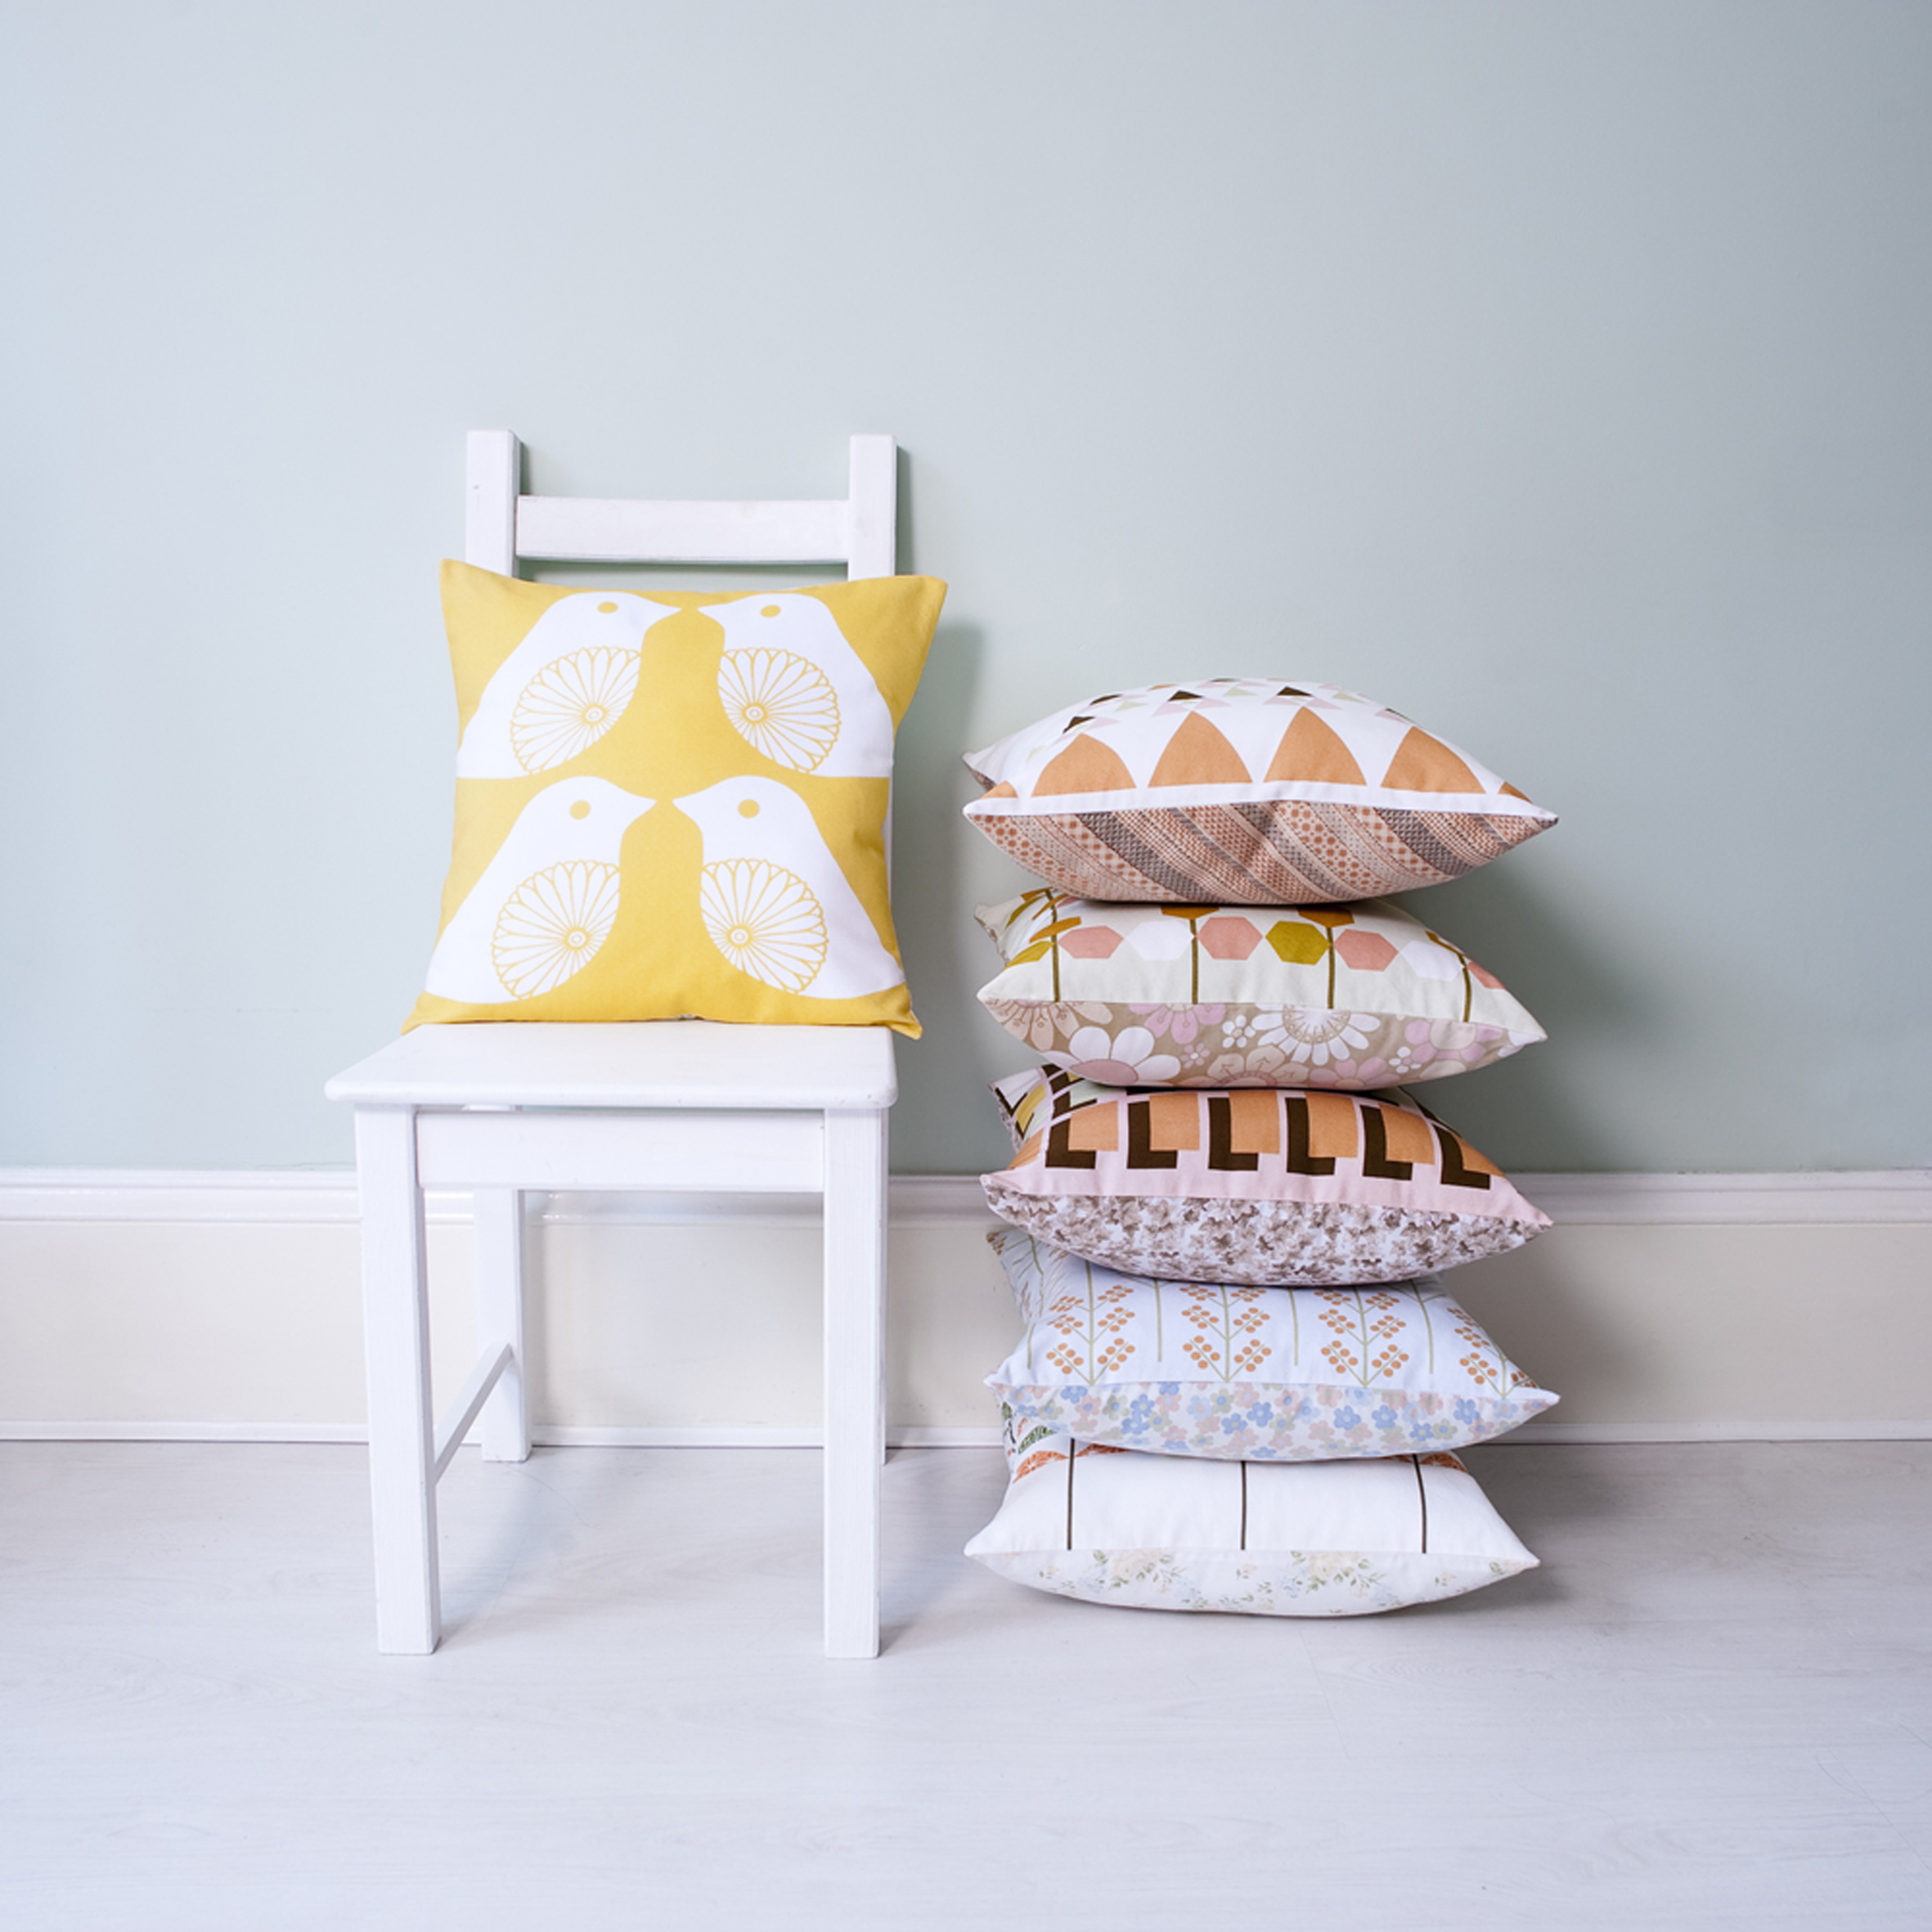 Clare Nicolson (B60) Stacked Cushions